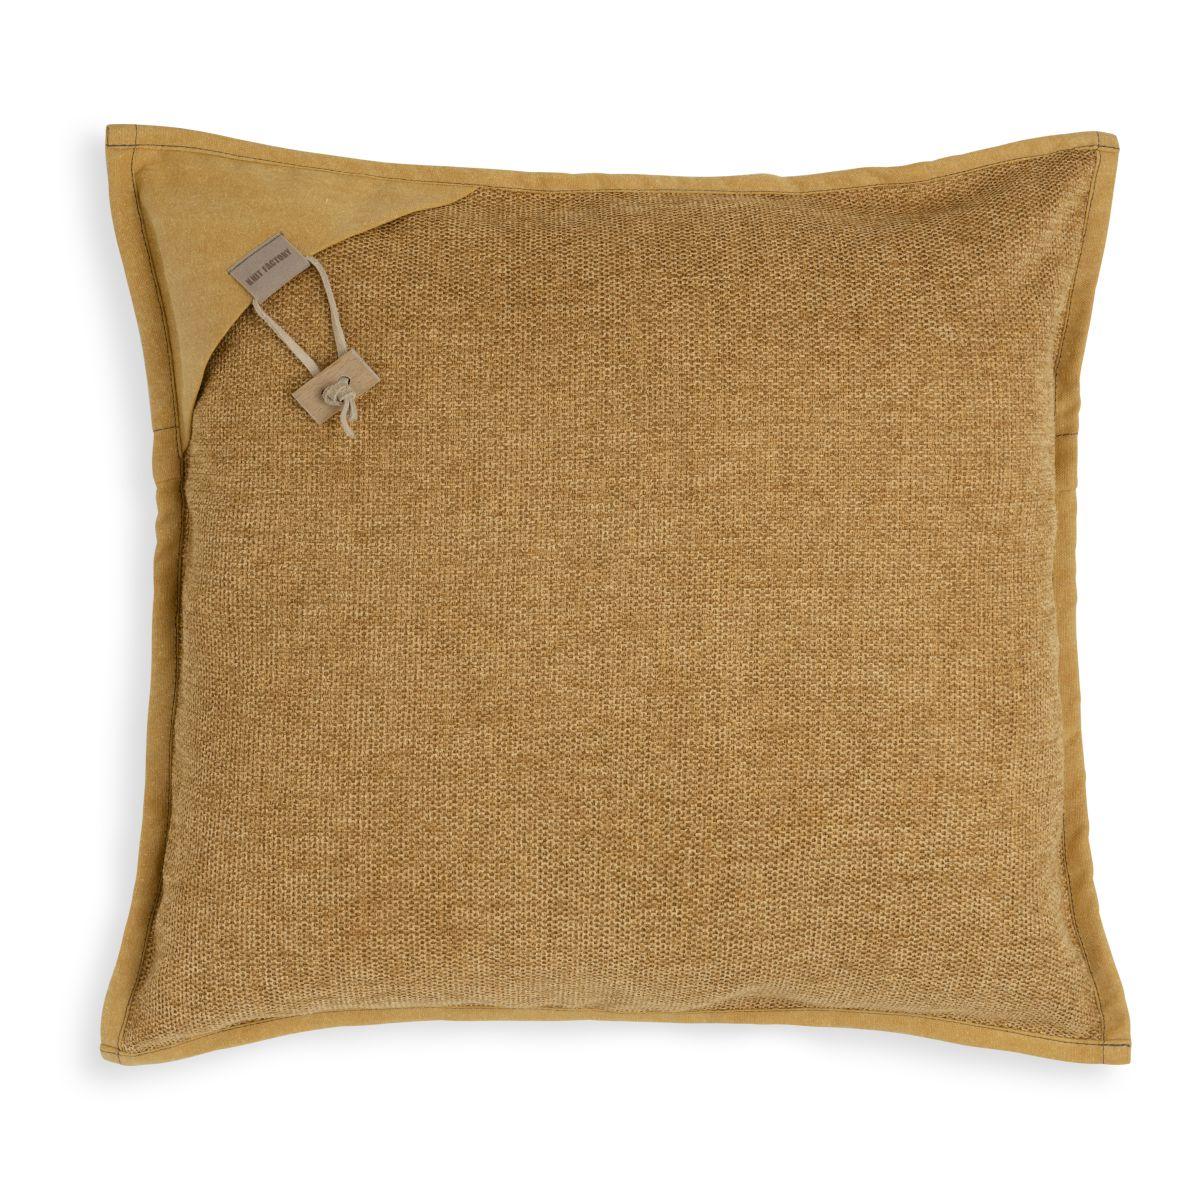 knit factory kf154012017 hope kussen oker 50x50 1